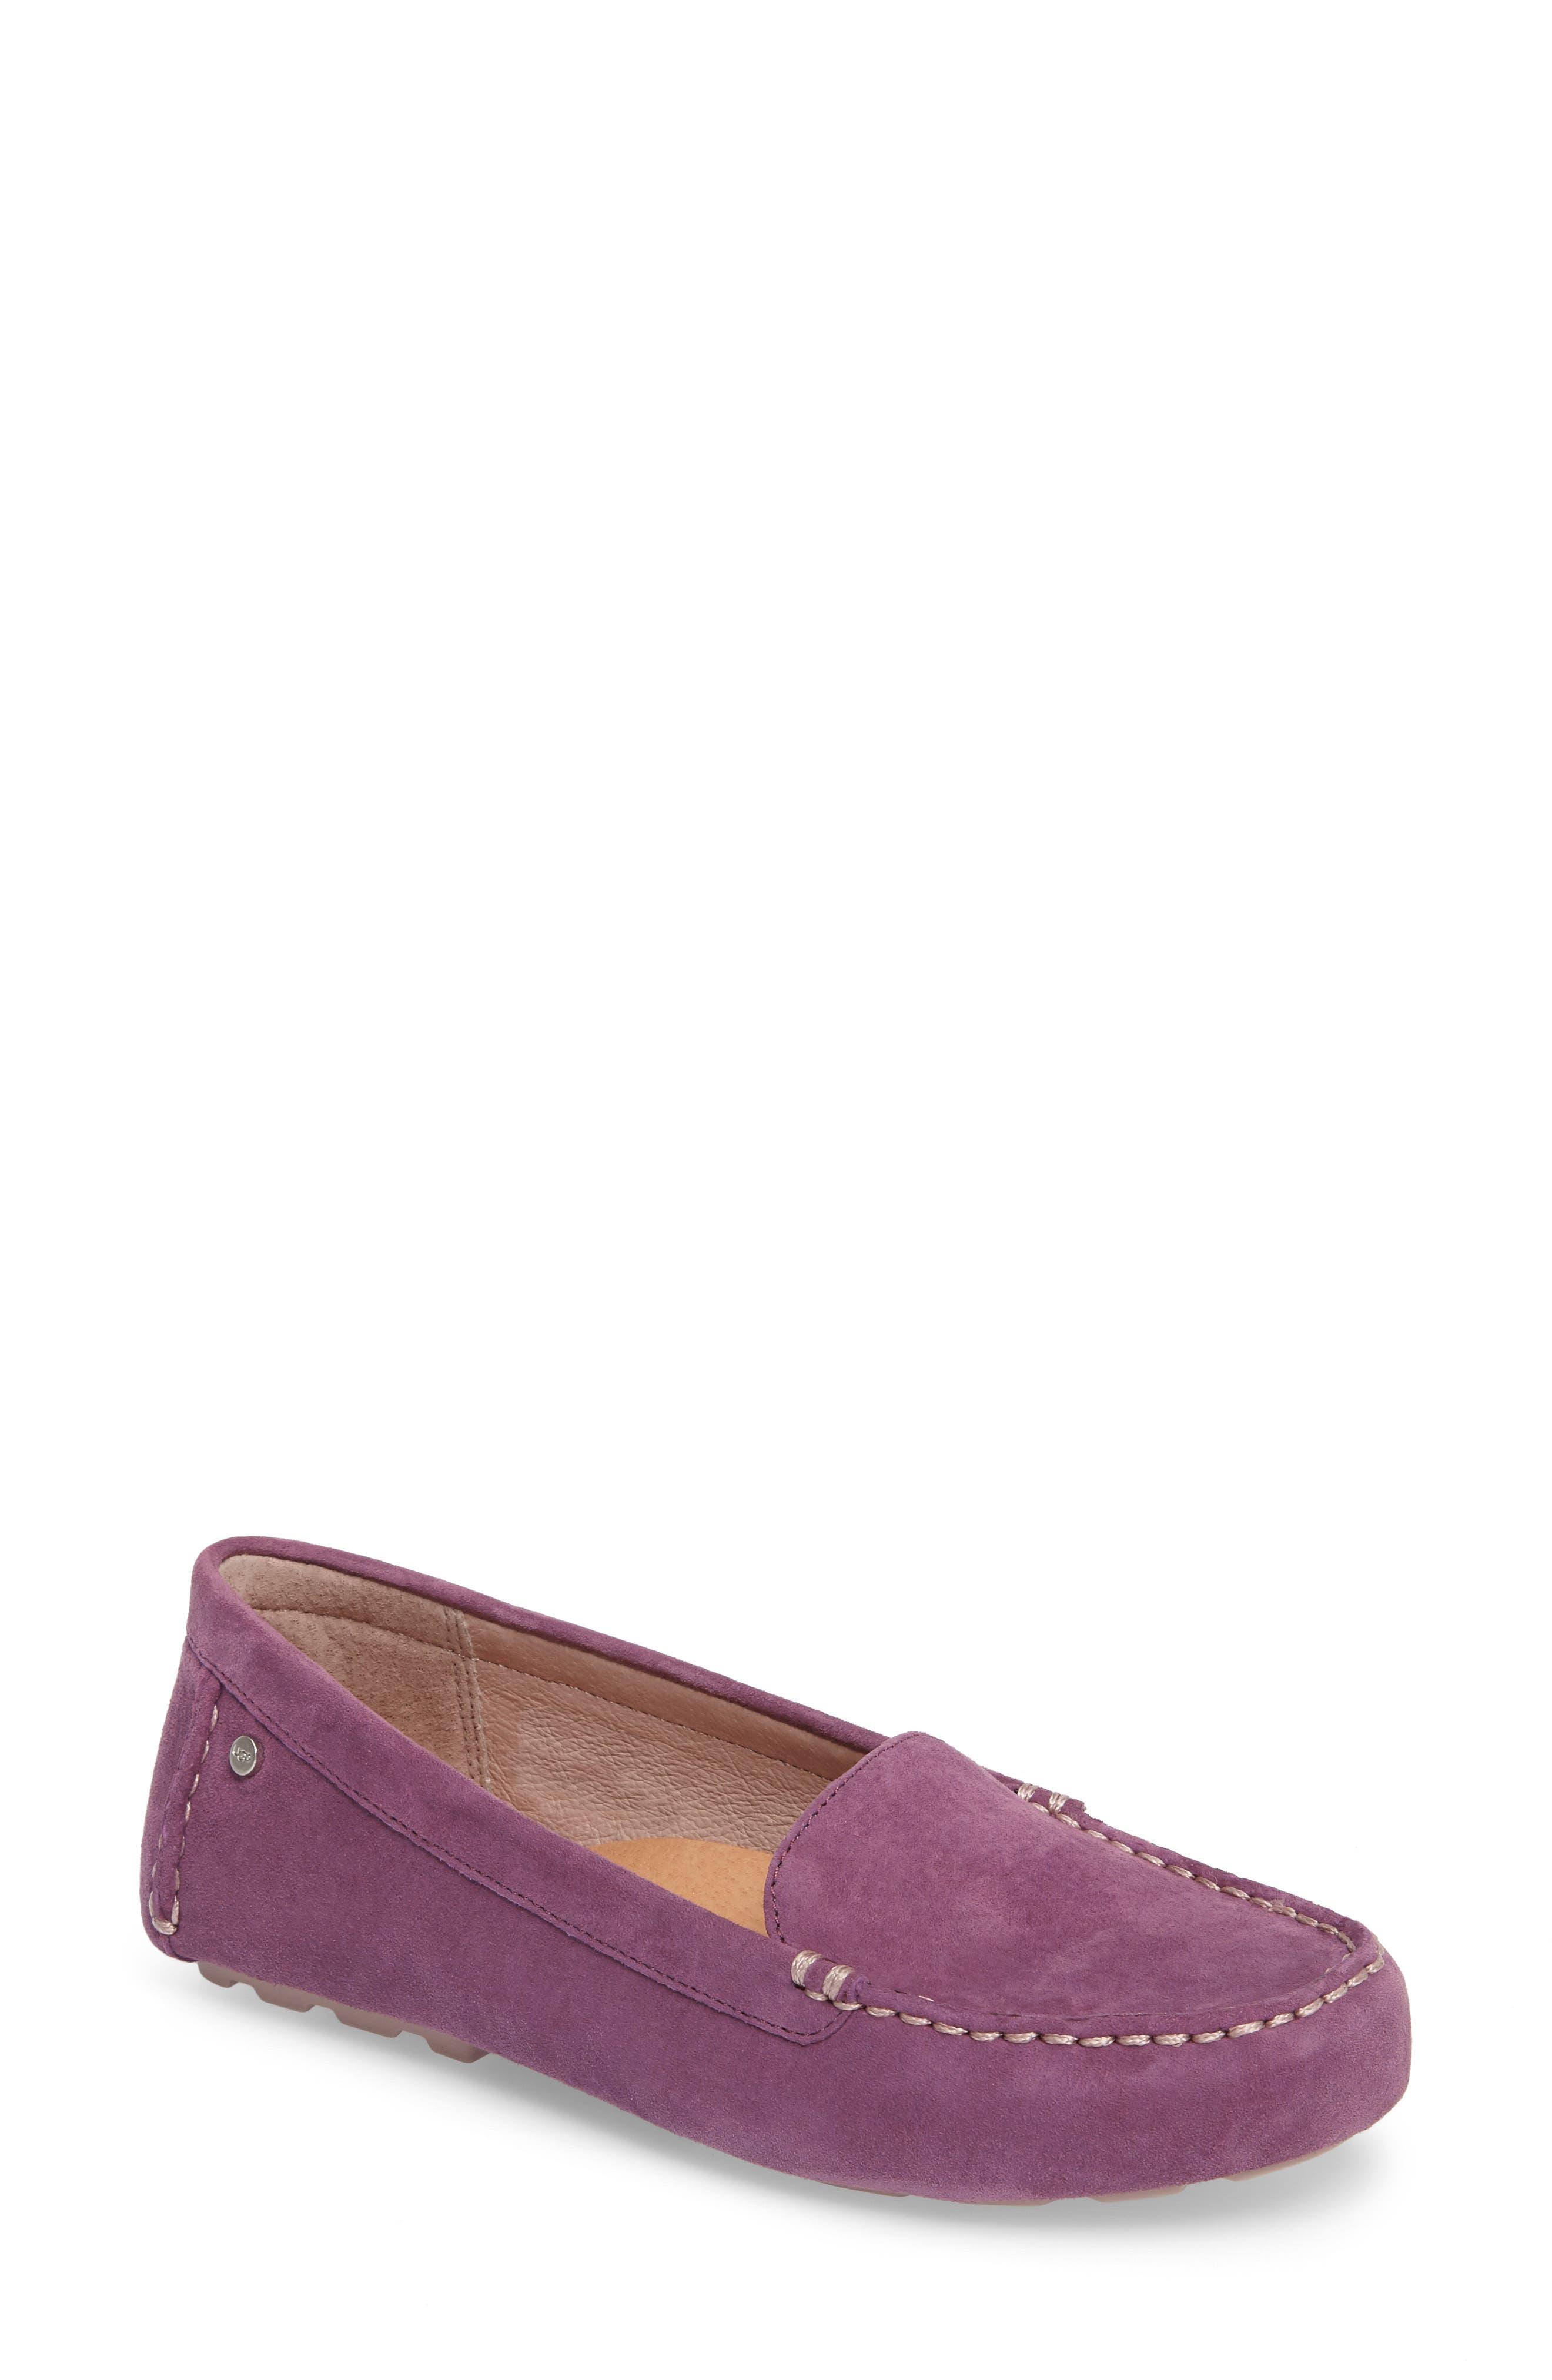 Alternate Image 1 Selected - UGG® Milana Moc Toe Flat (Women)